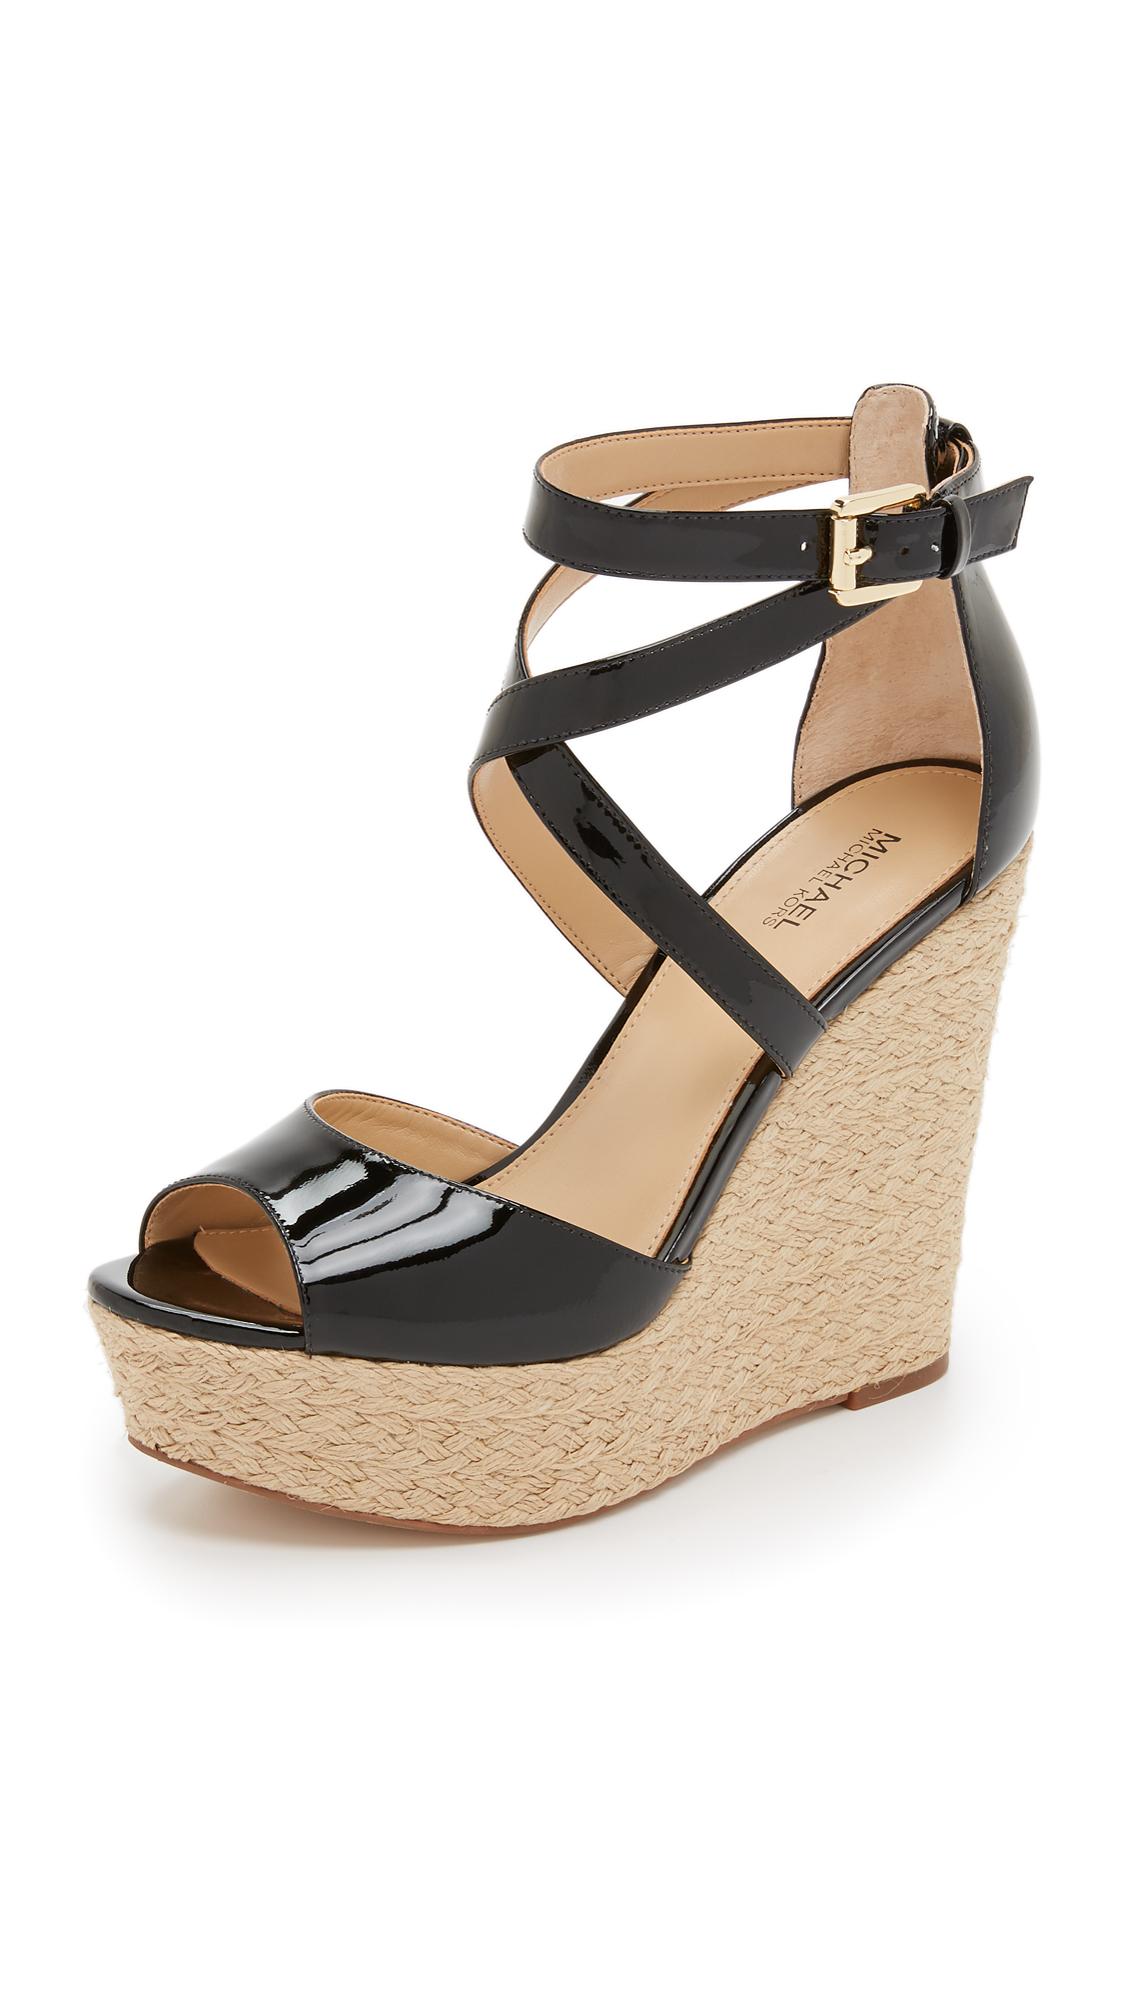 583bb8ff6ae Lyst - MICHAEL Michael Kors Gabriella Wedge Sandals in Black